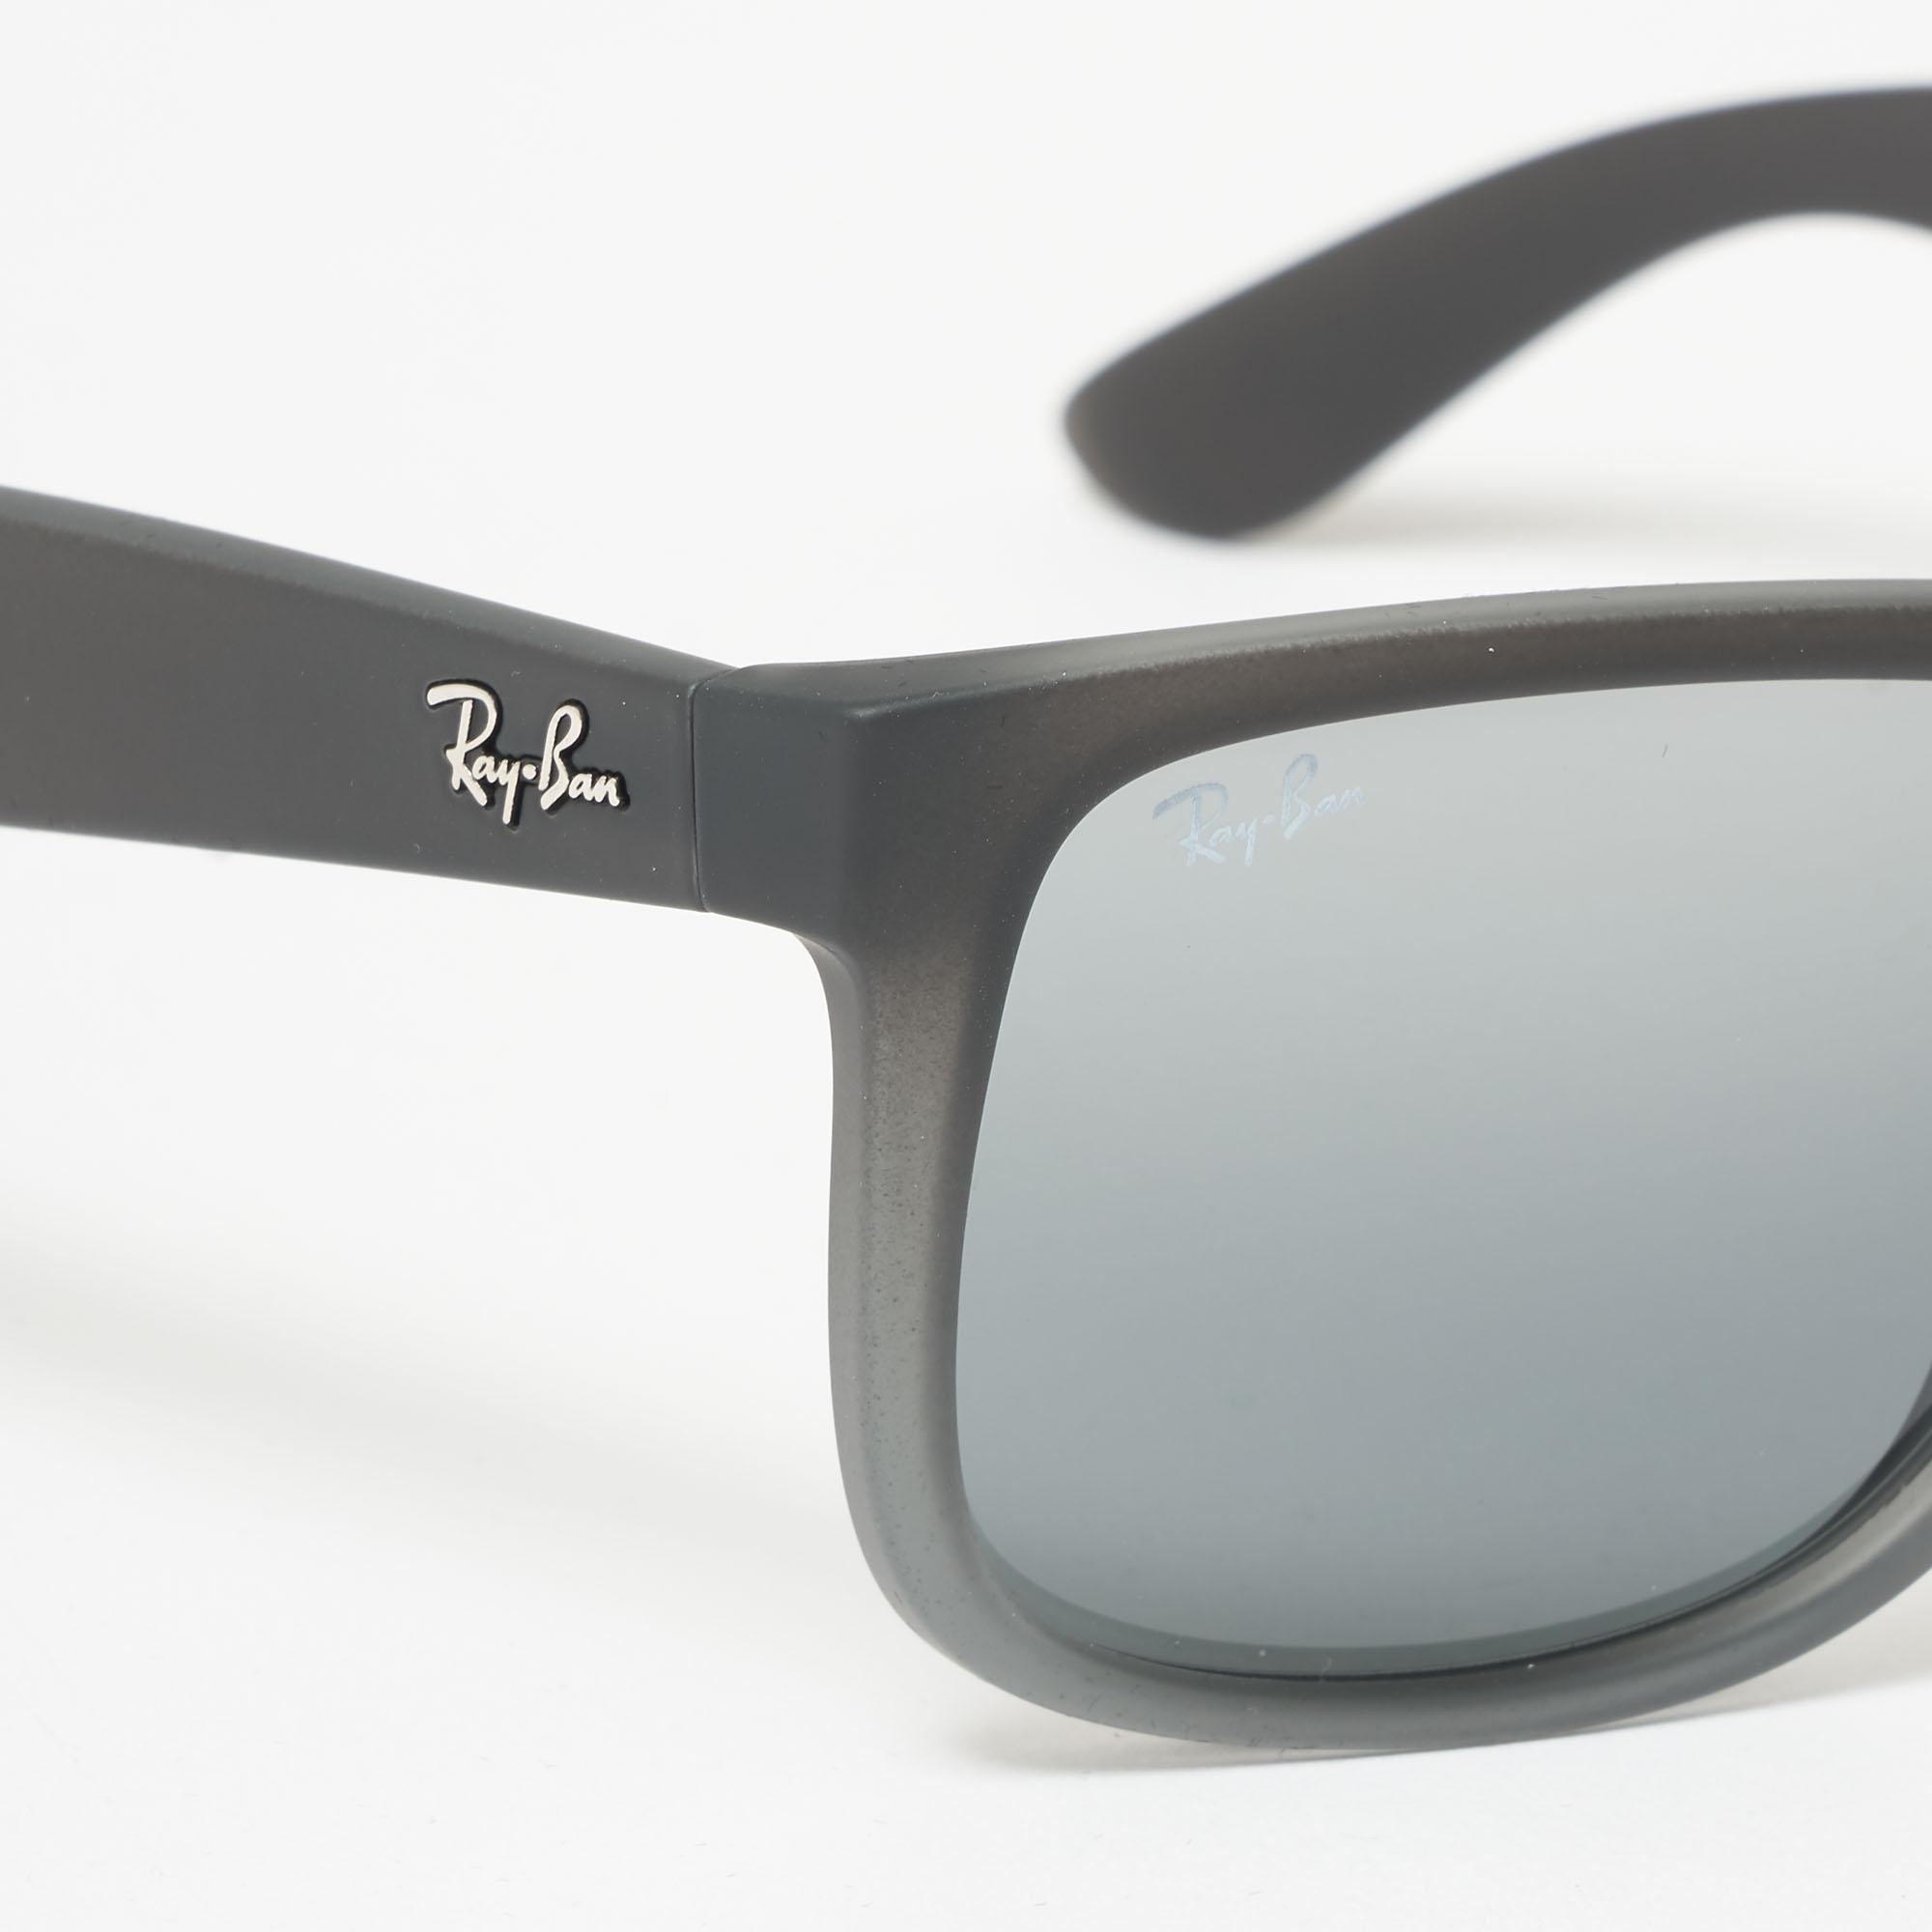 b711ddd397 Ray-Ban - Gray Smoke Grey Justin Sunglasses - Silver Gradient Mirror Lenses  for Men. View fullscreen